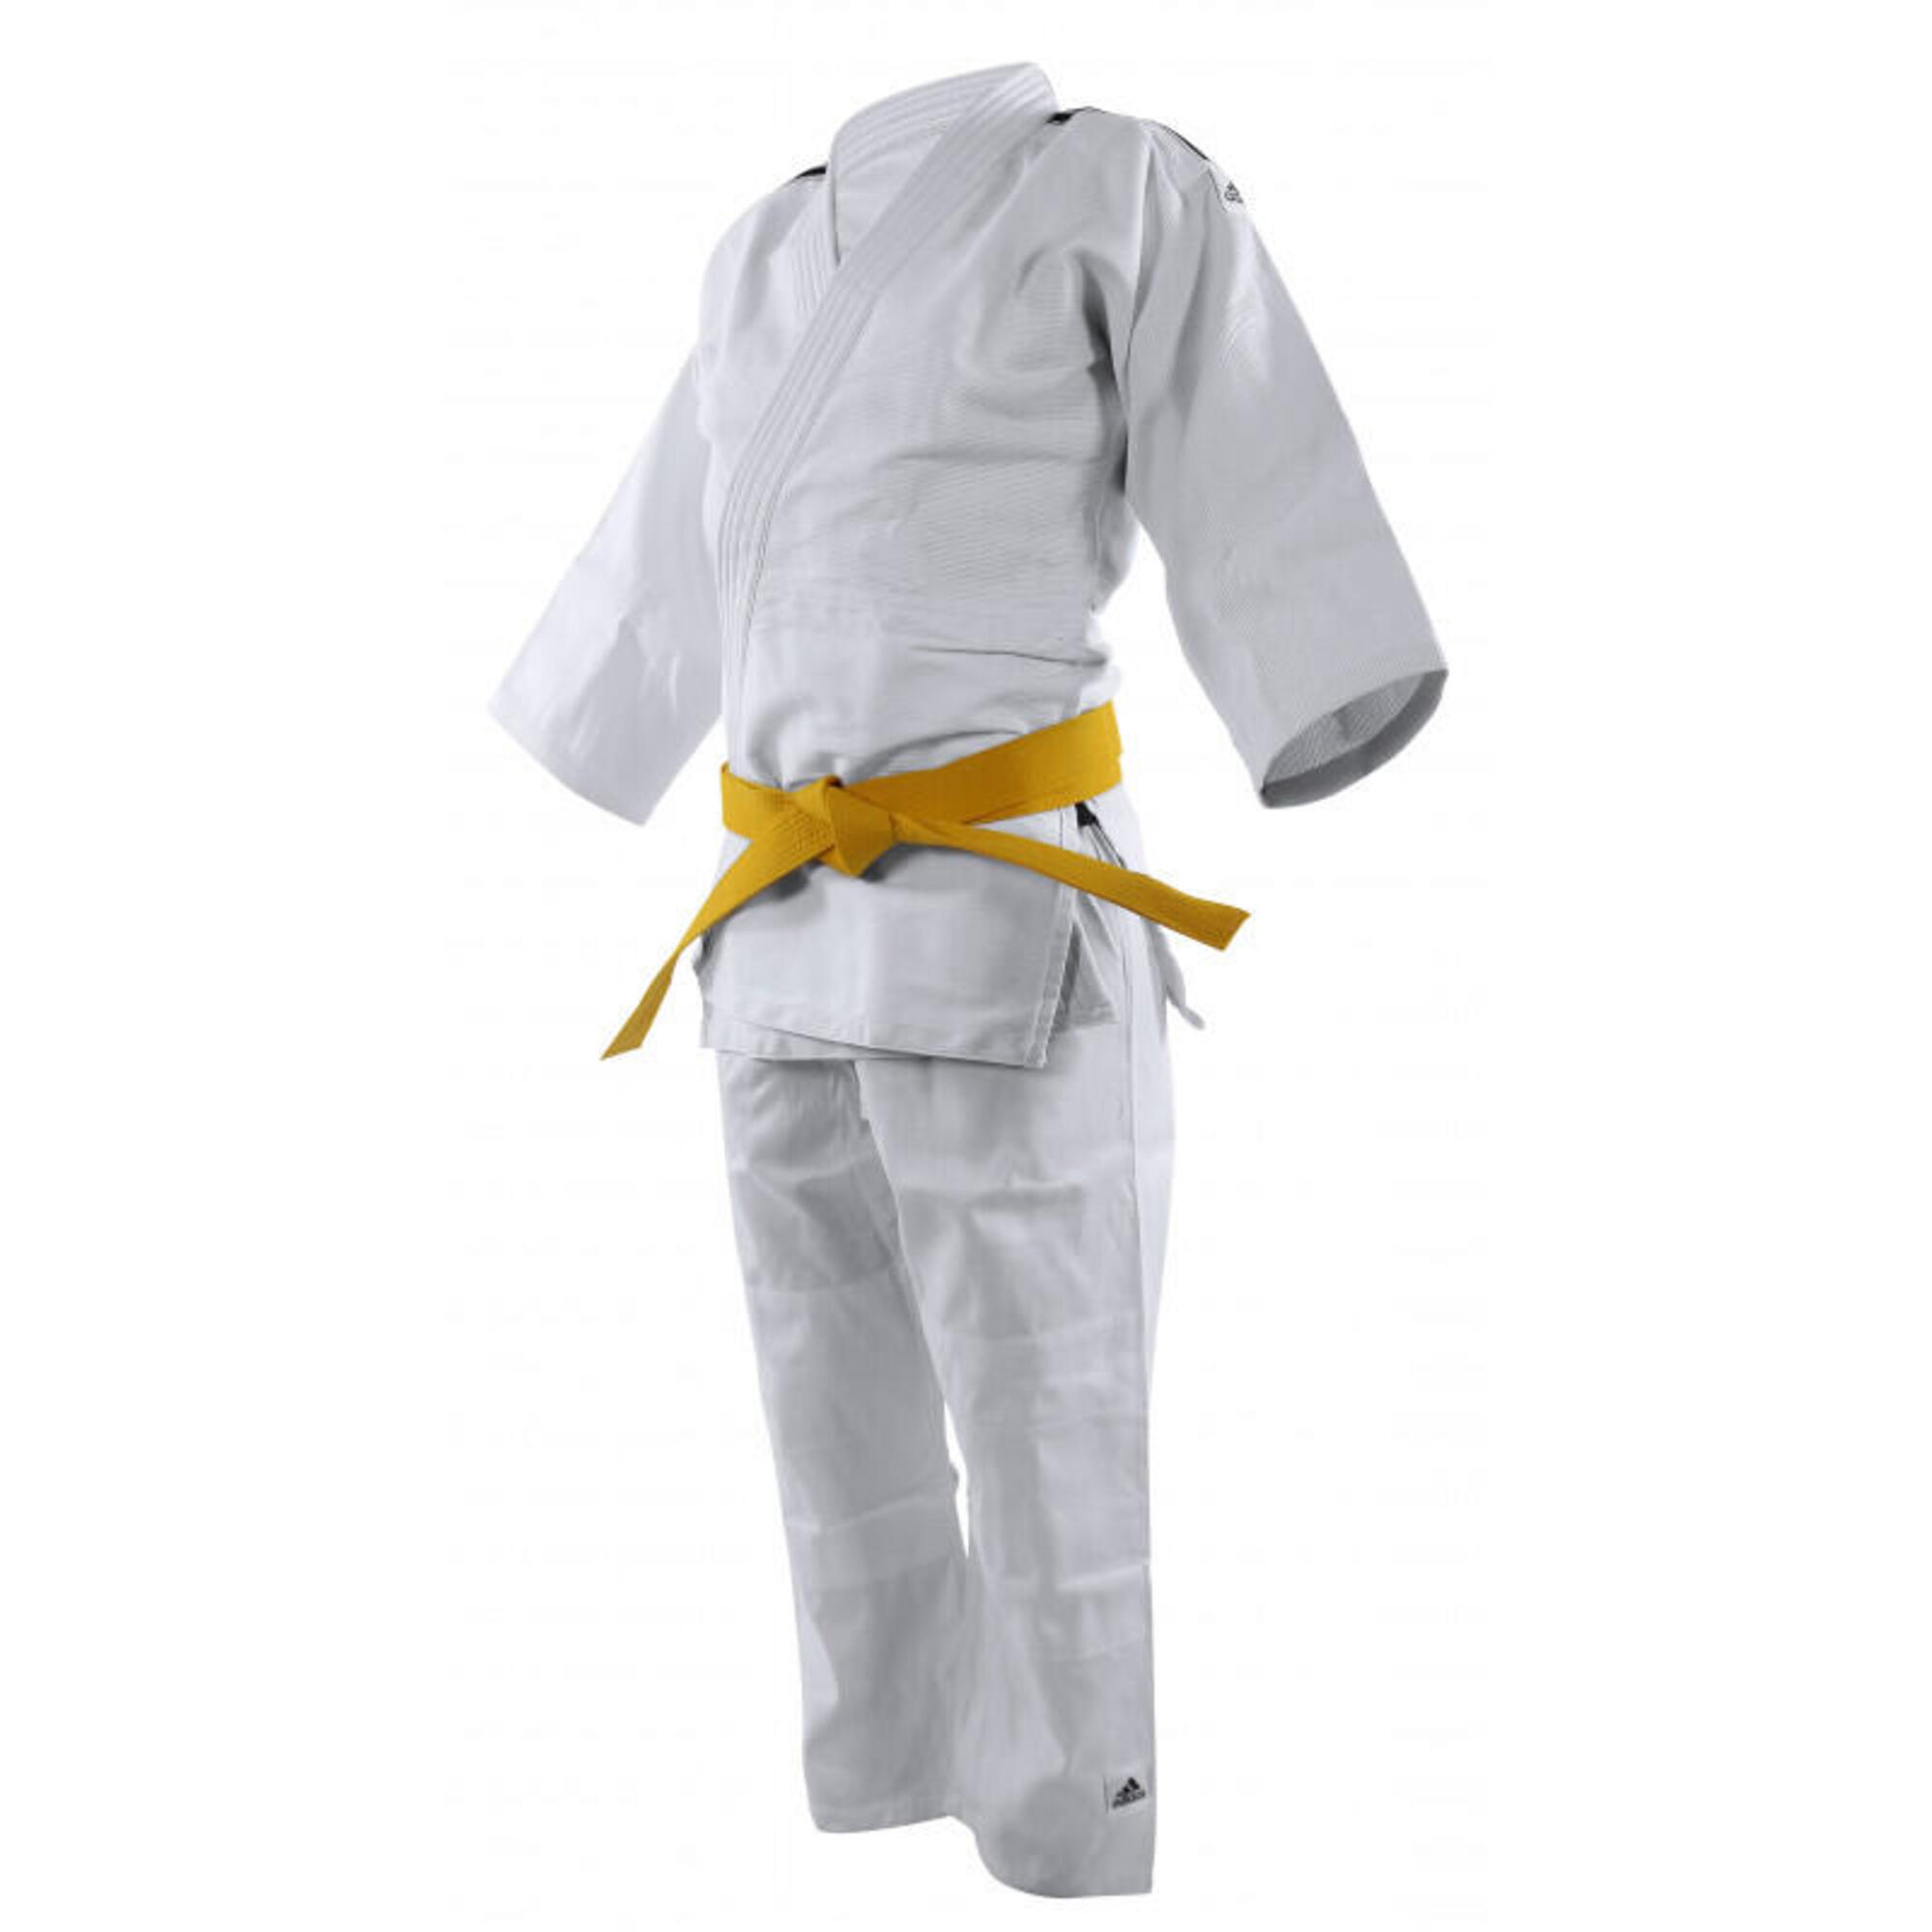 Adidas judopak J350 Club